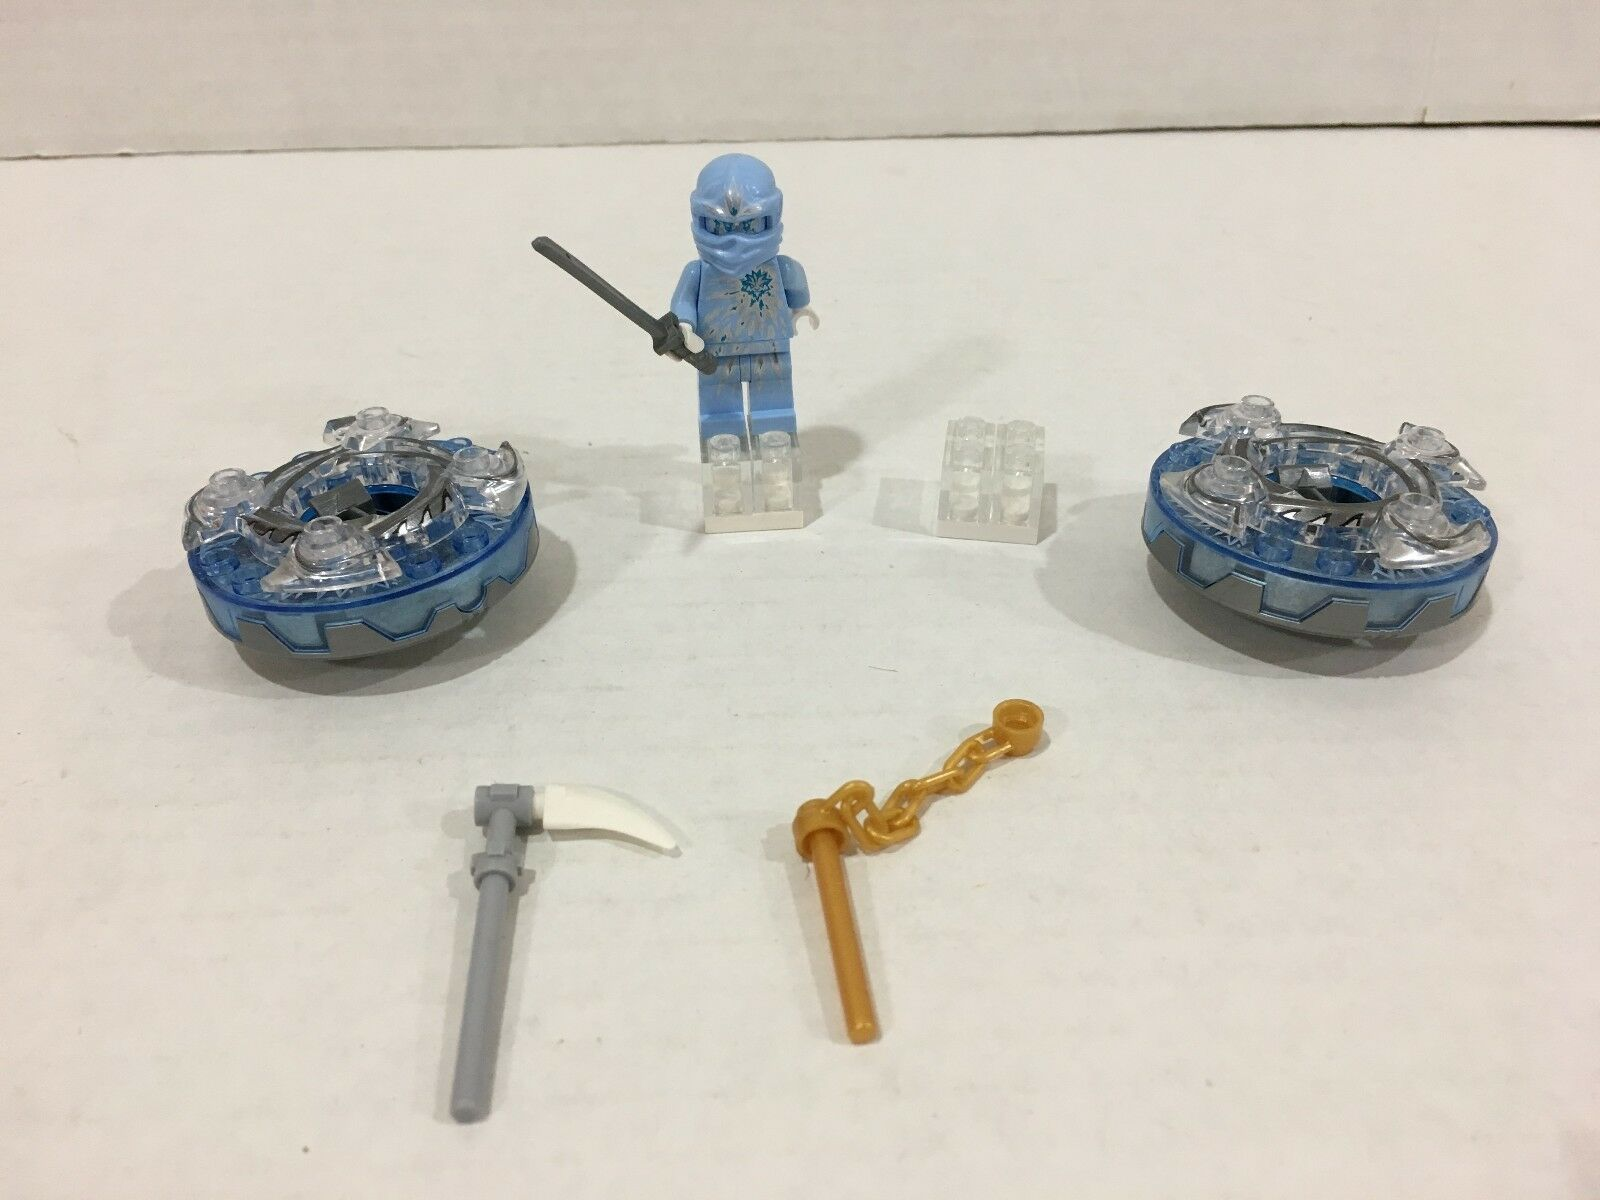 LEGO 9590 9590 9590 Ninjago NRG Zane FREE Shipping  6139f3